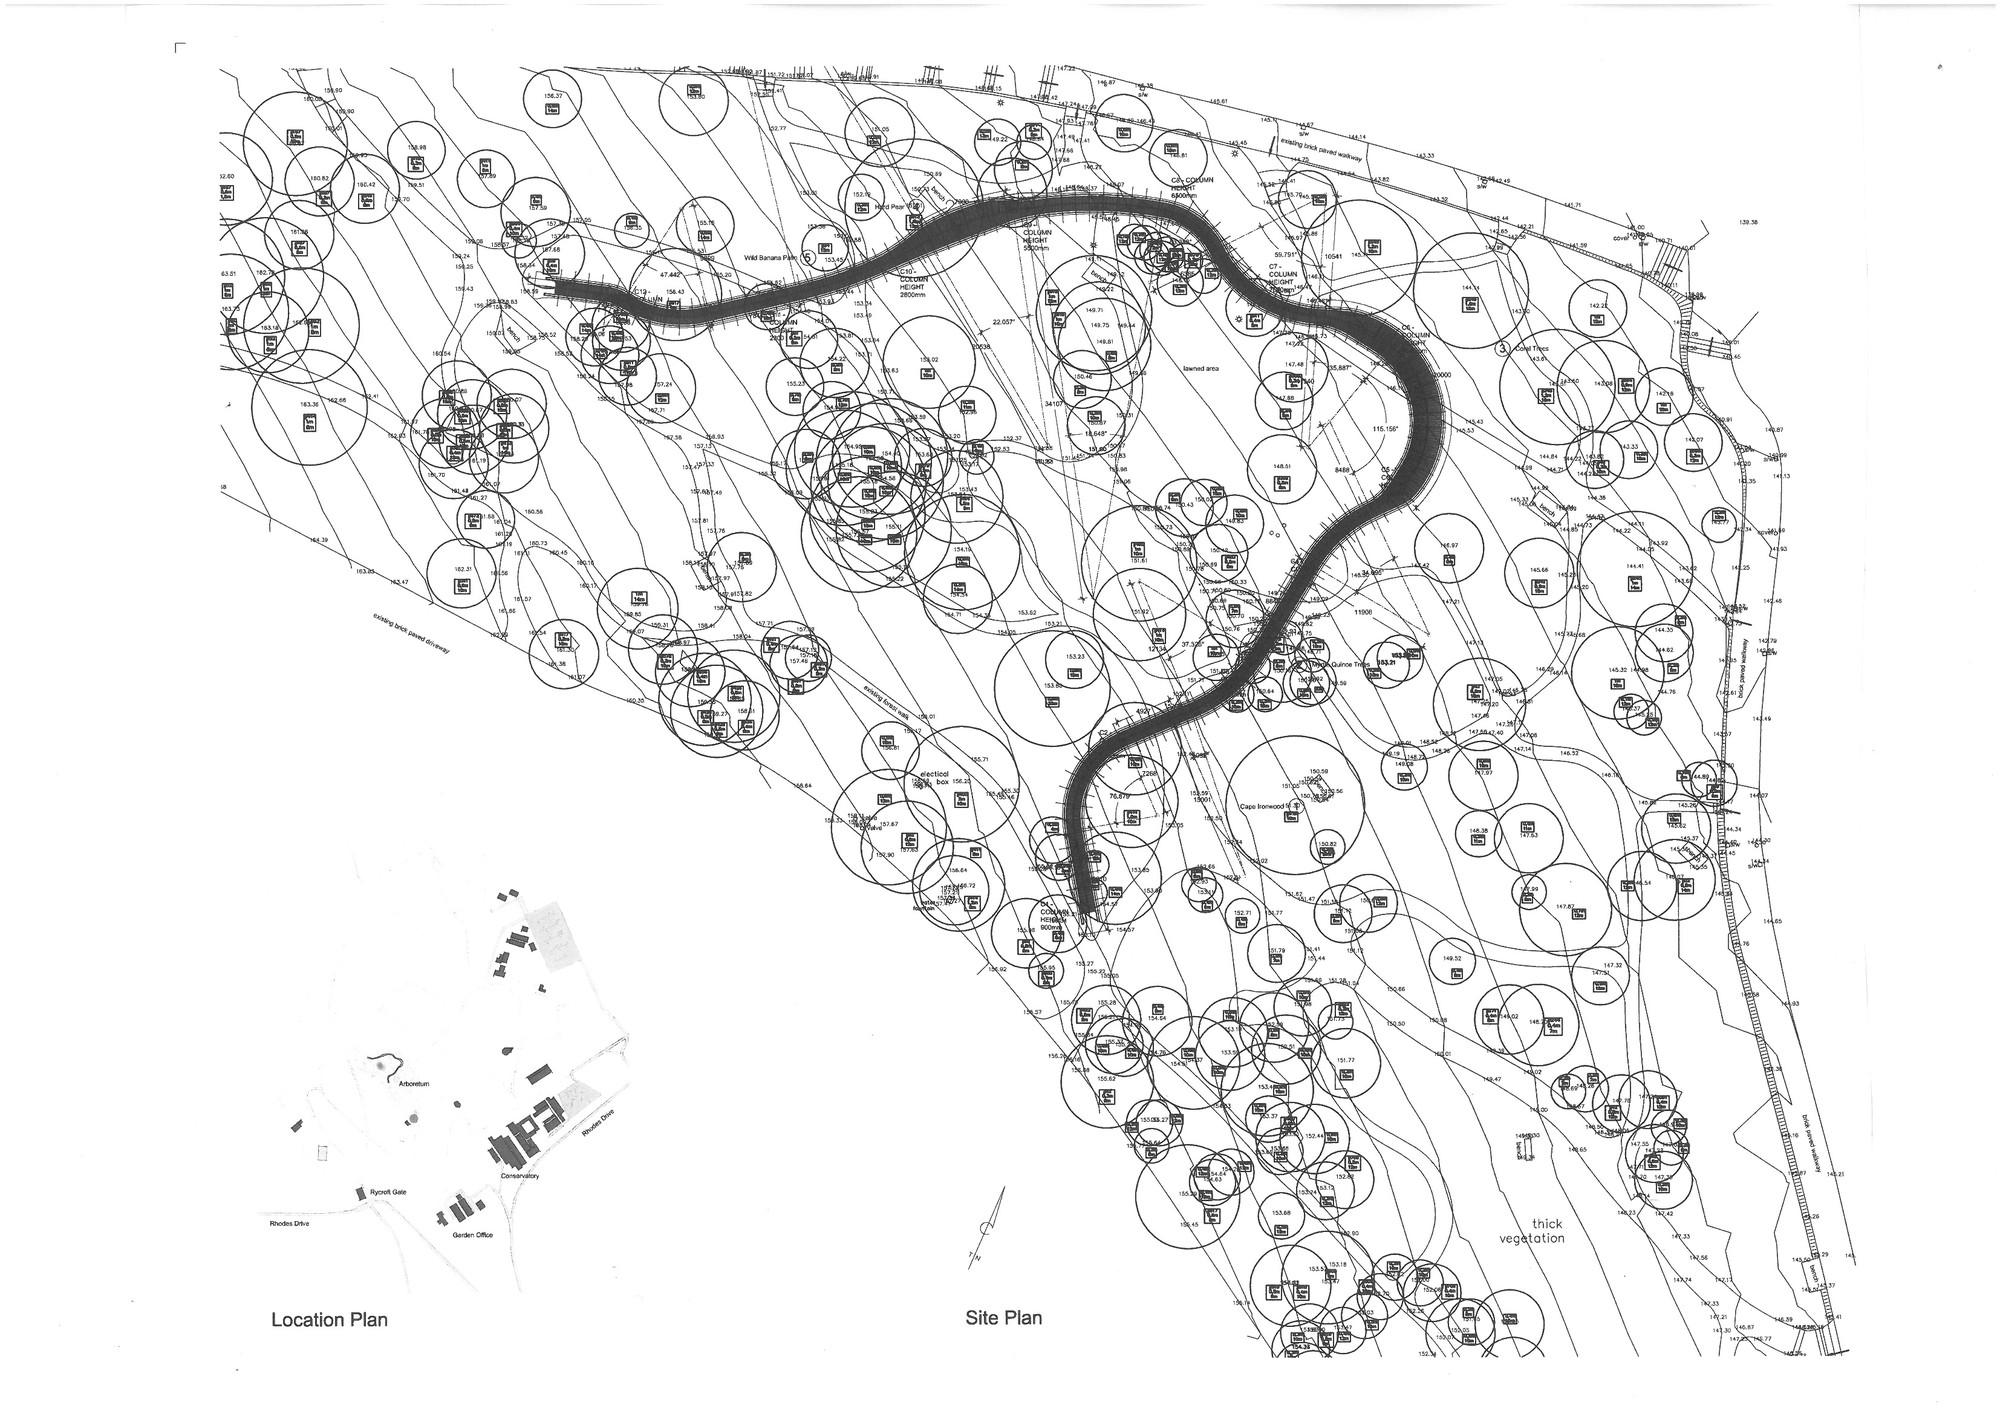 2000x1414 Gallery Of Kirstenbosch Centenary Tree Canopy Walkway Mark